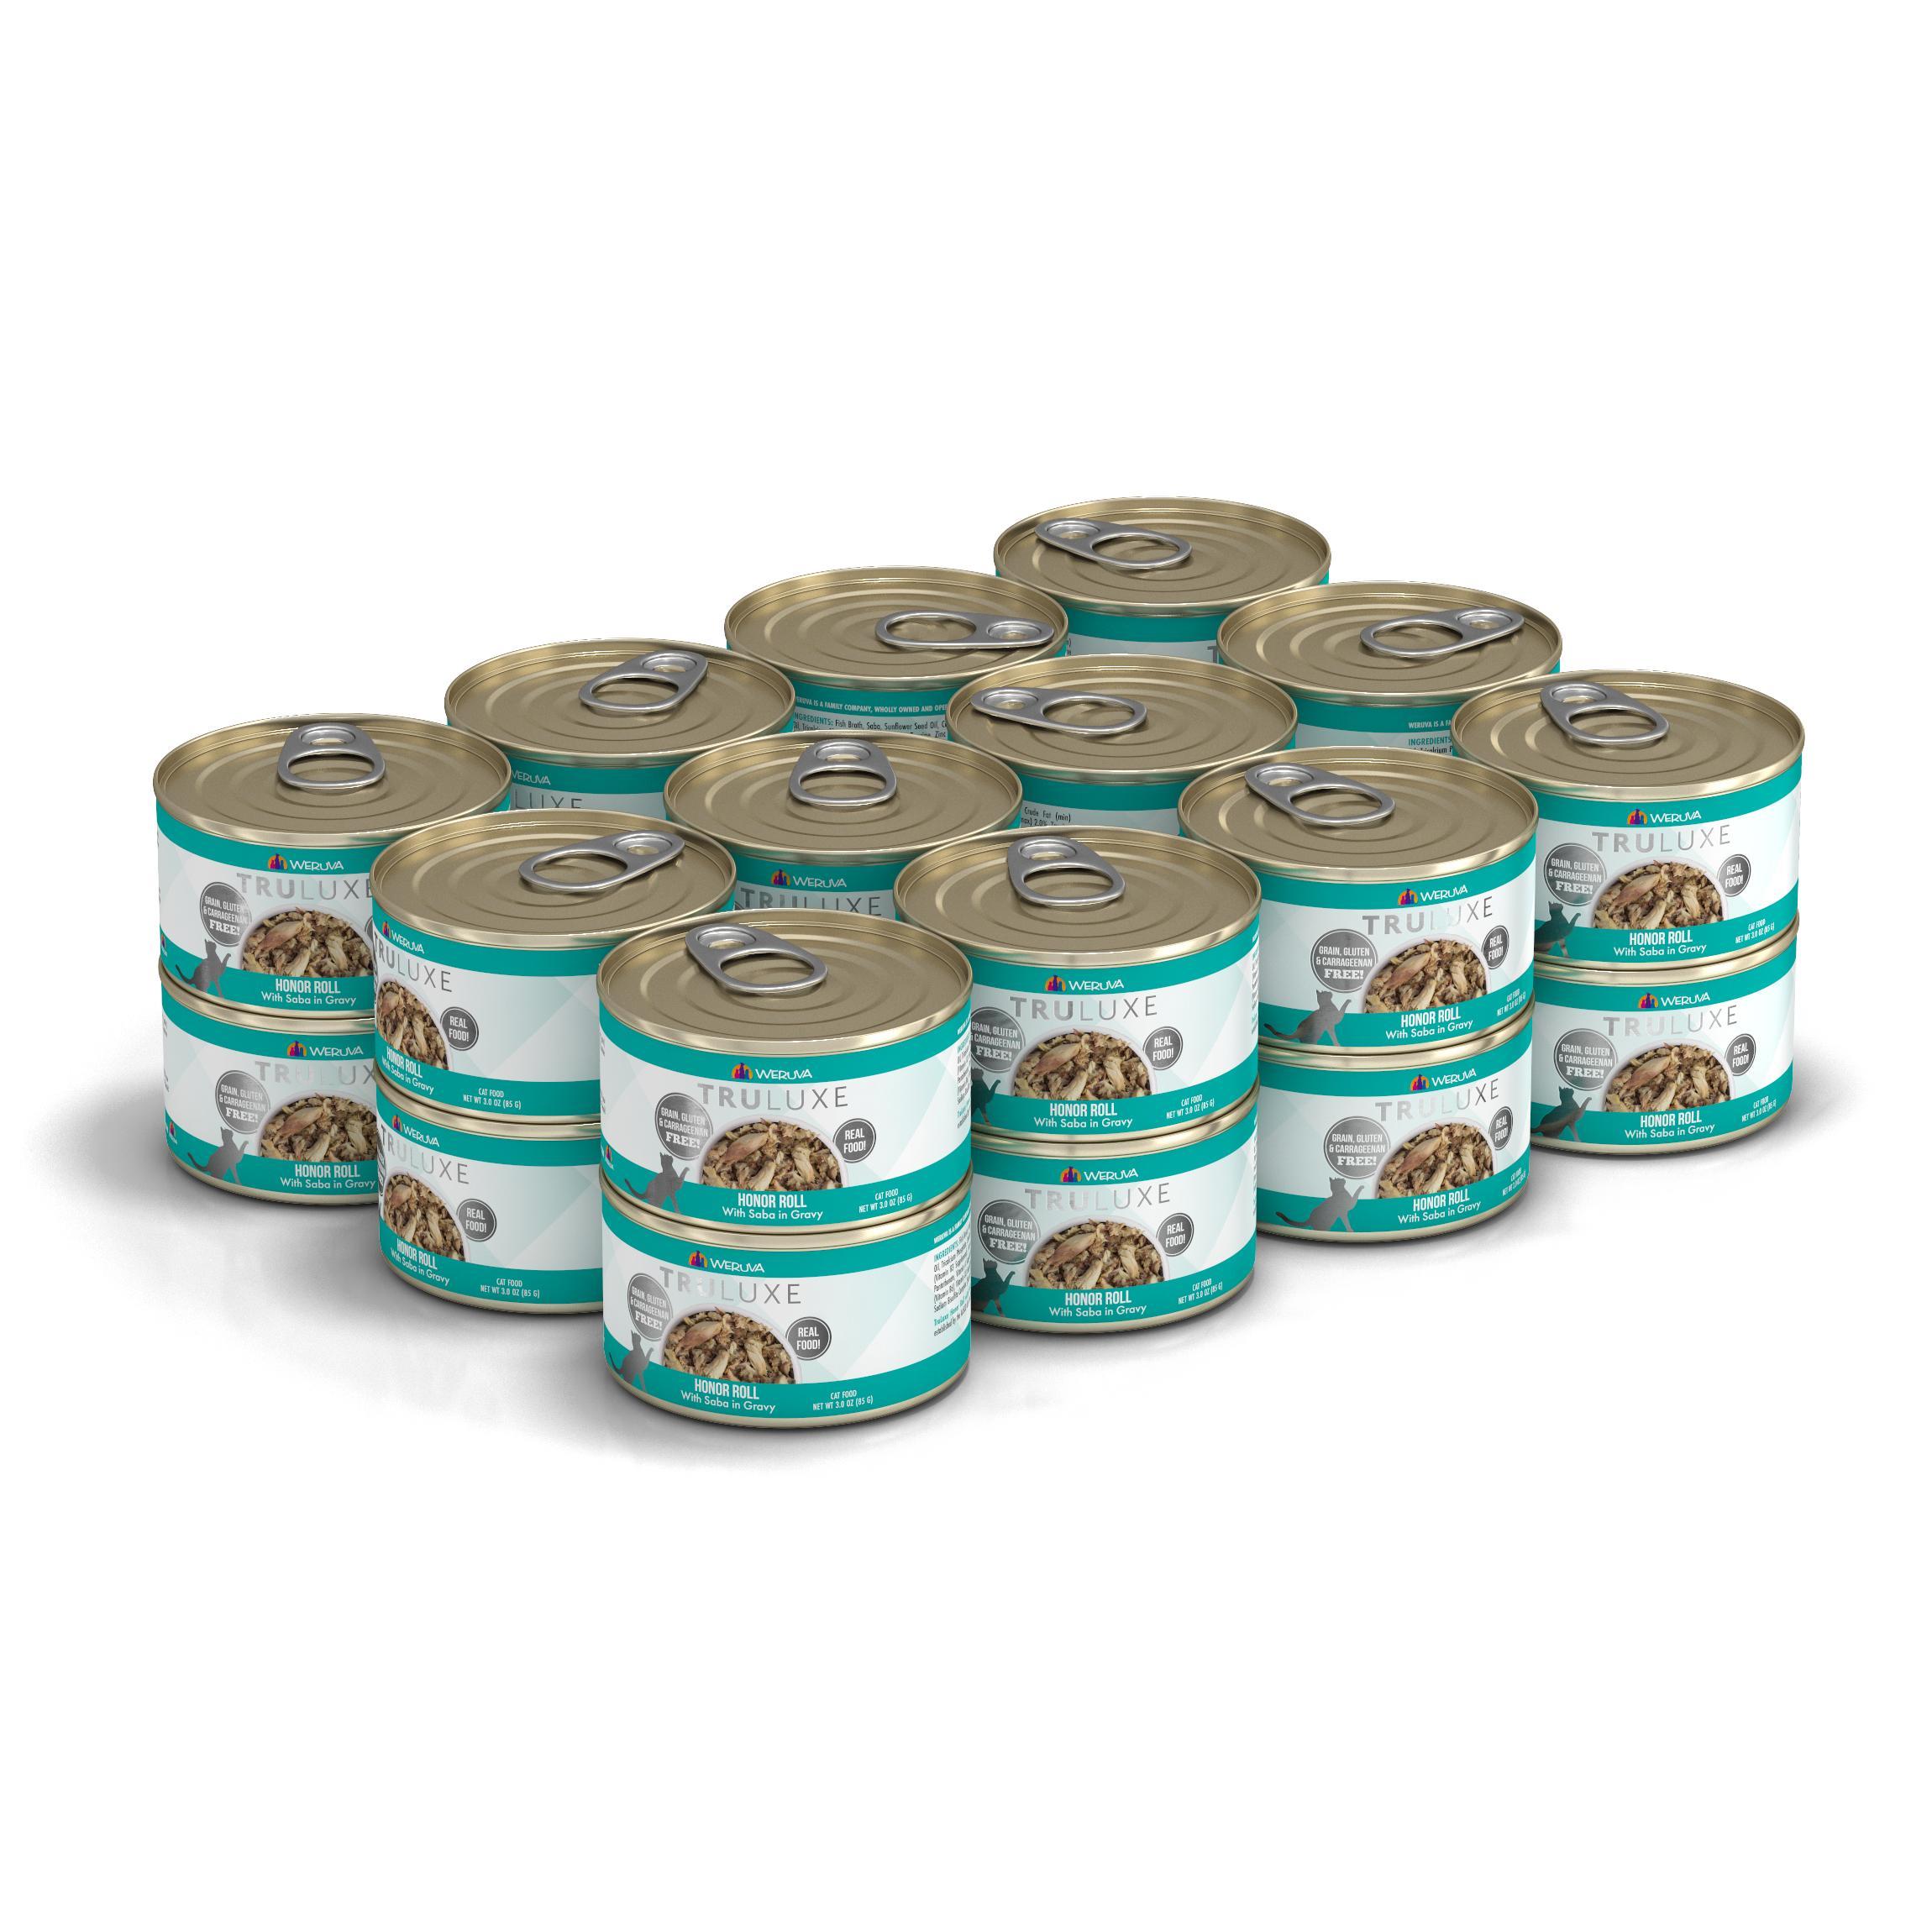 Weruva Cat Truluxe Honor Roll with Saba in Gravy Grain-Free Wet Cat Food, 3-oz, case of 24